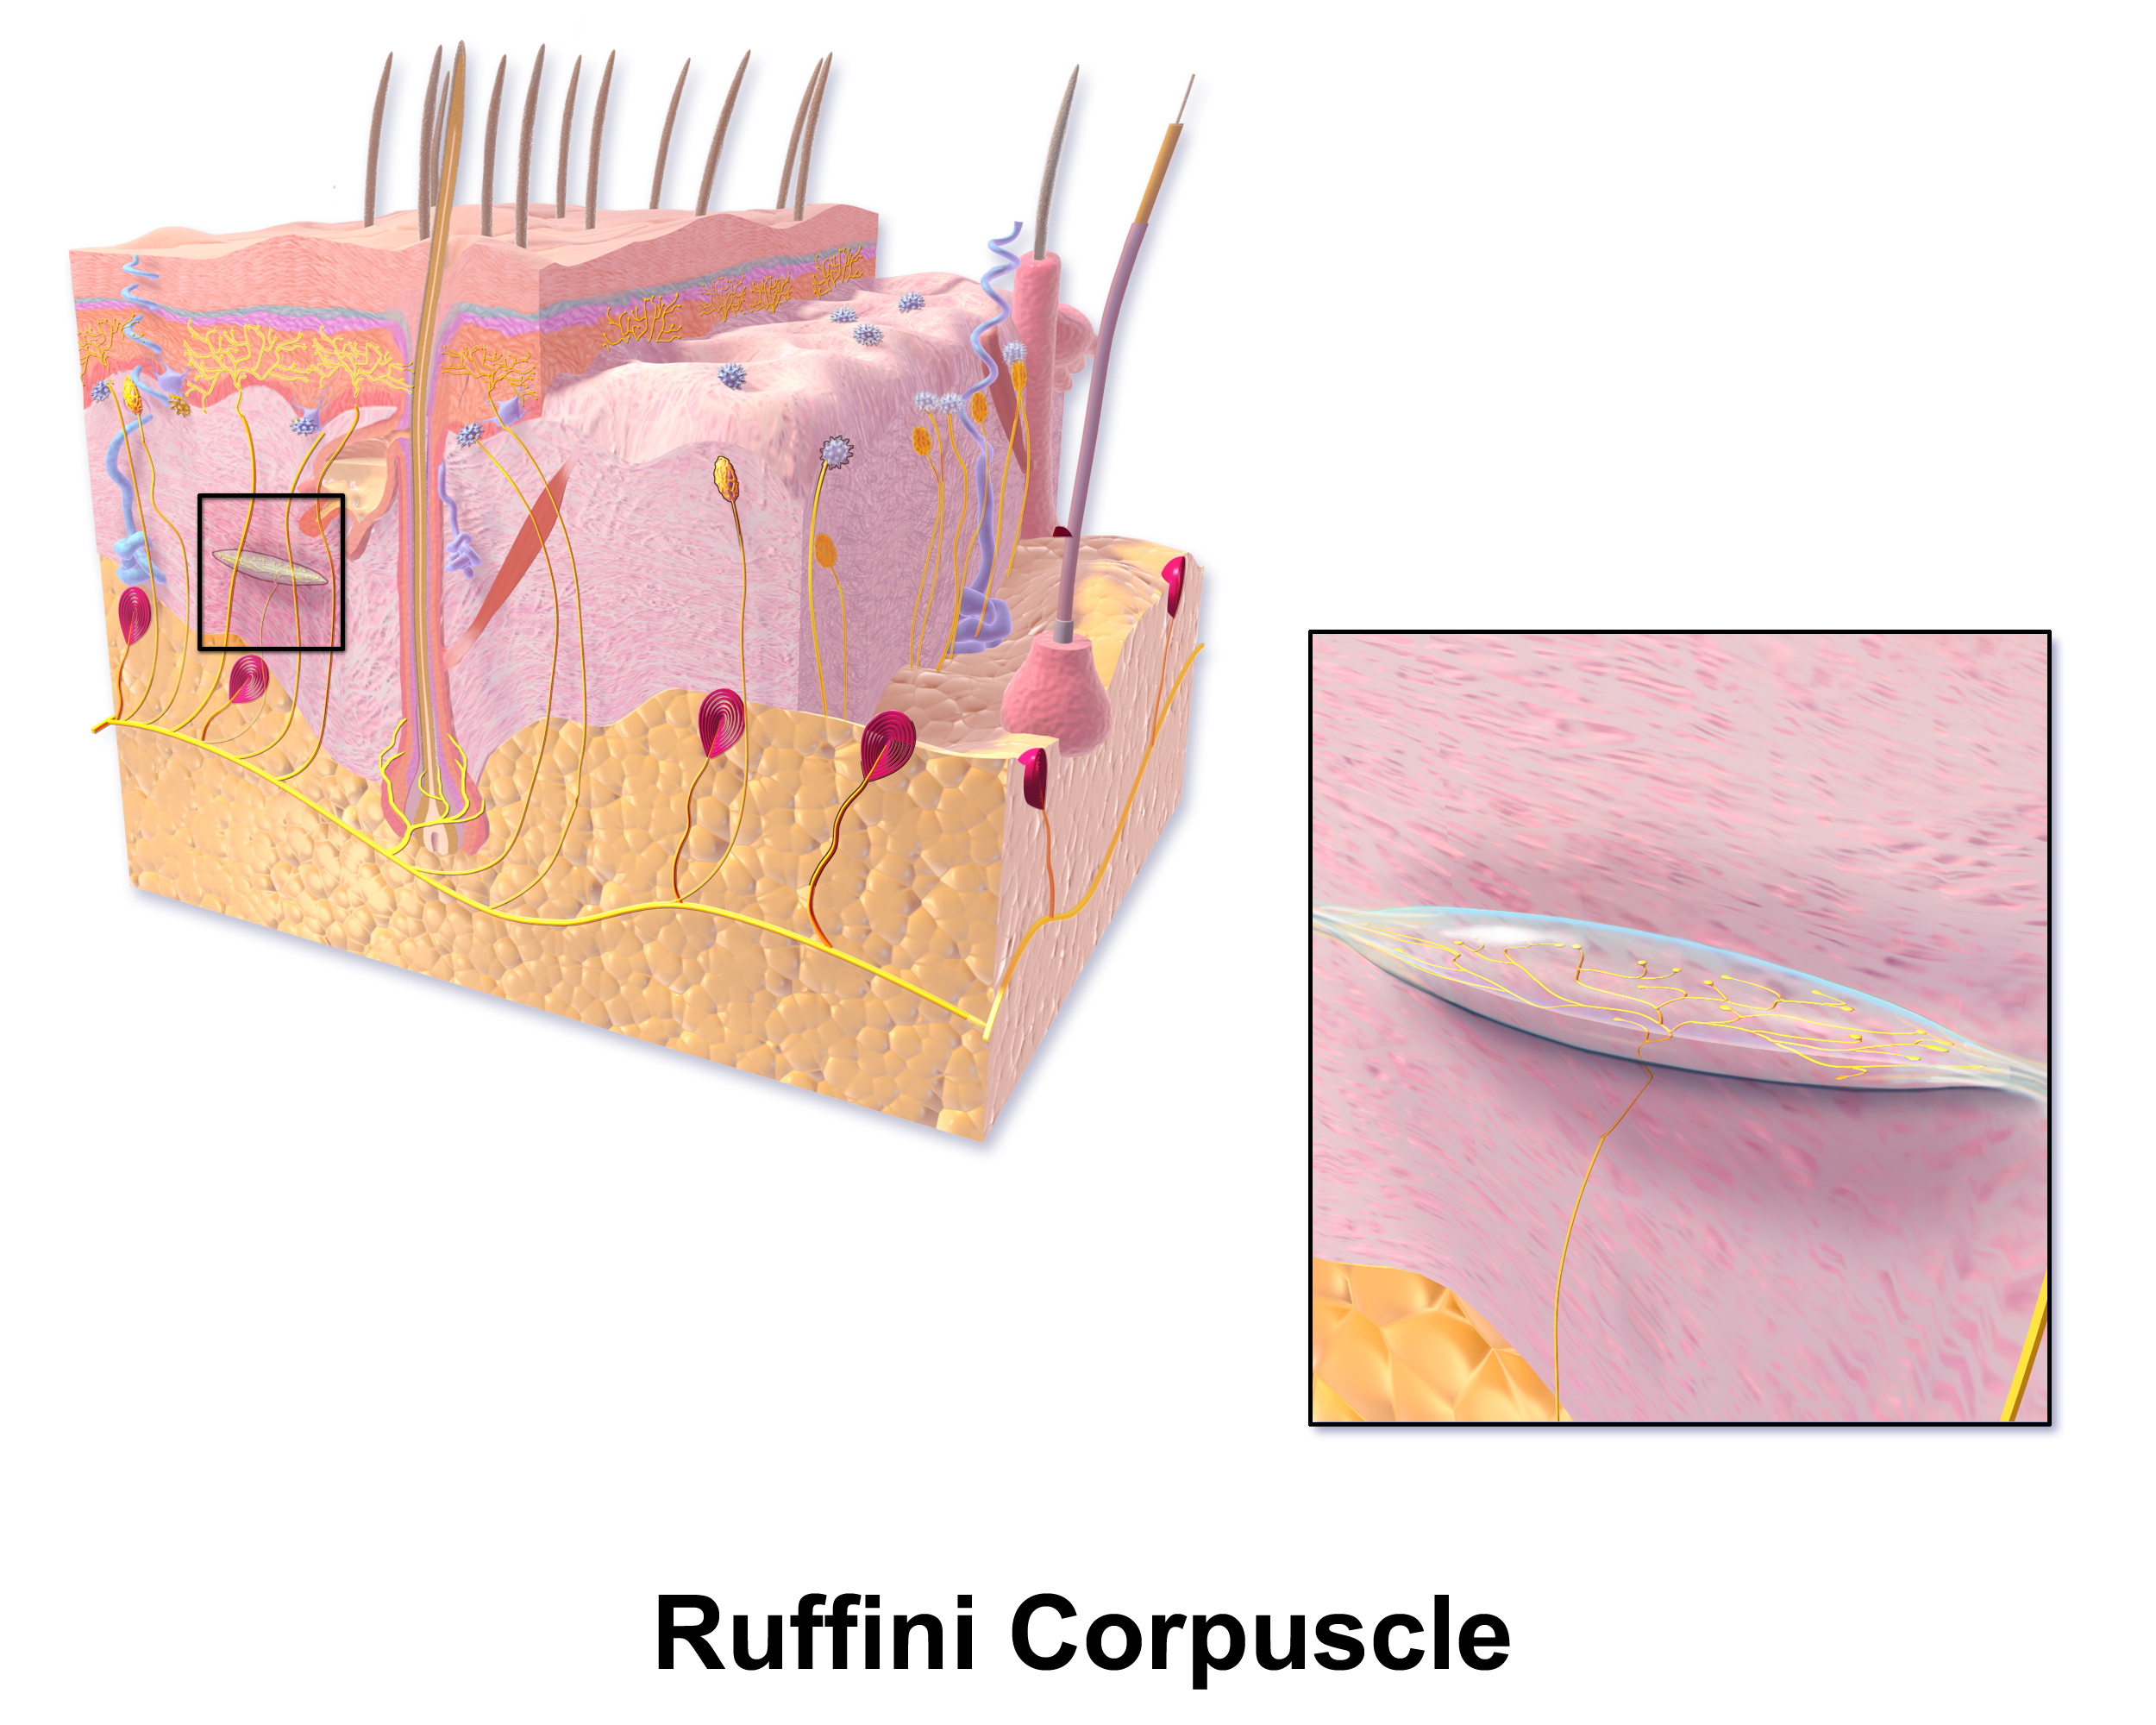 ����blausen 0807 skin ruffinicorpusclepng wikipedia